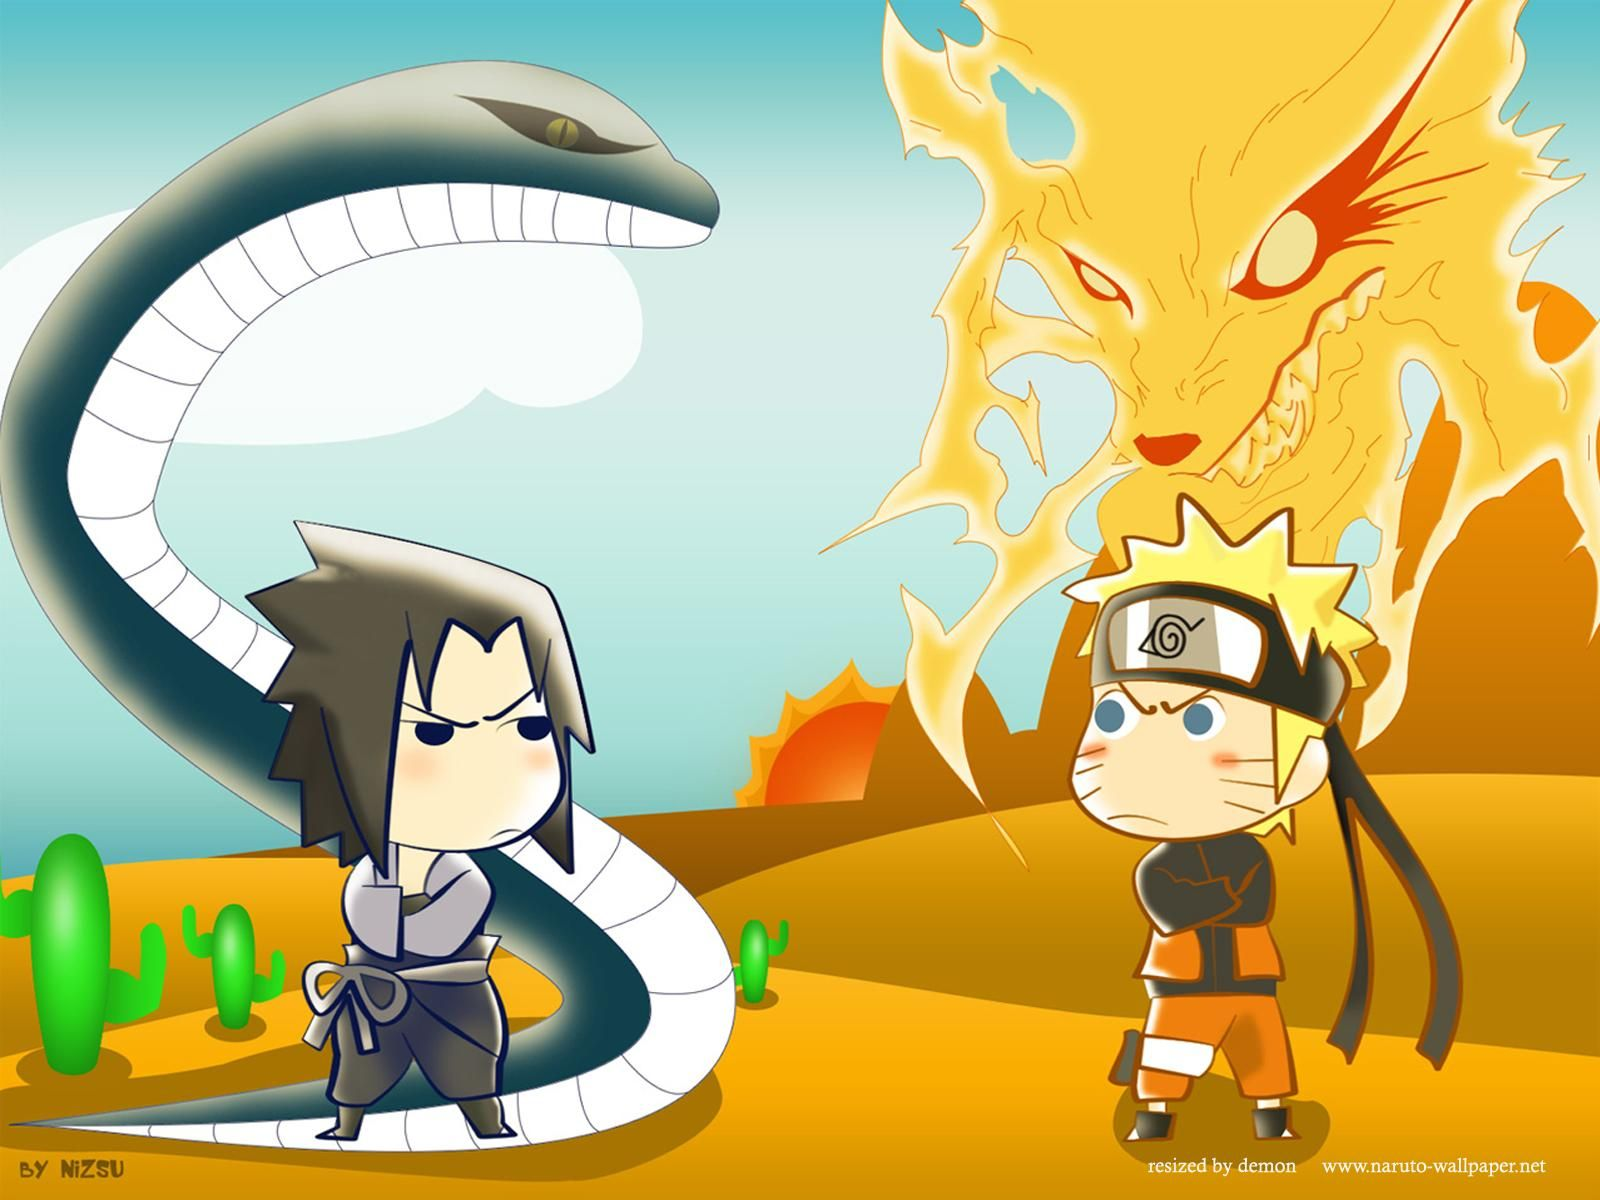 Unduh 960 Gambar Animasi Bergerak Naruto Vs Sasuke HD